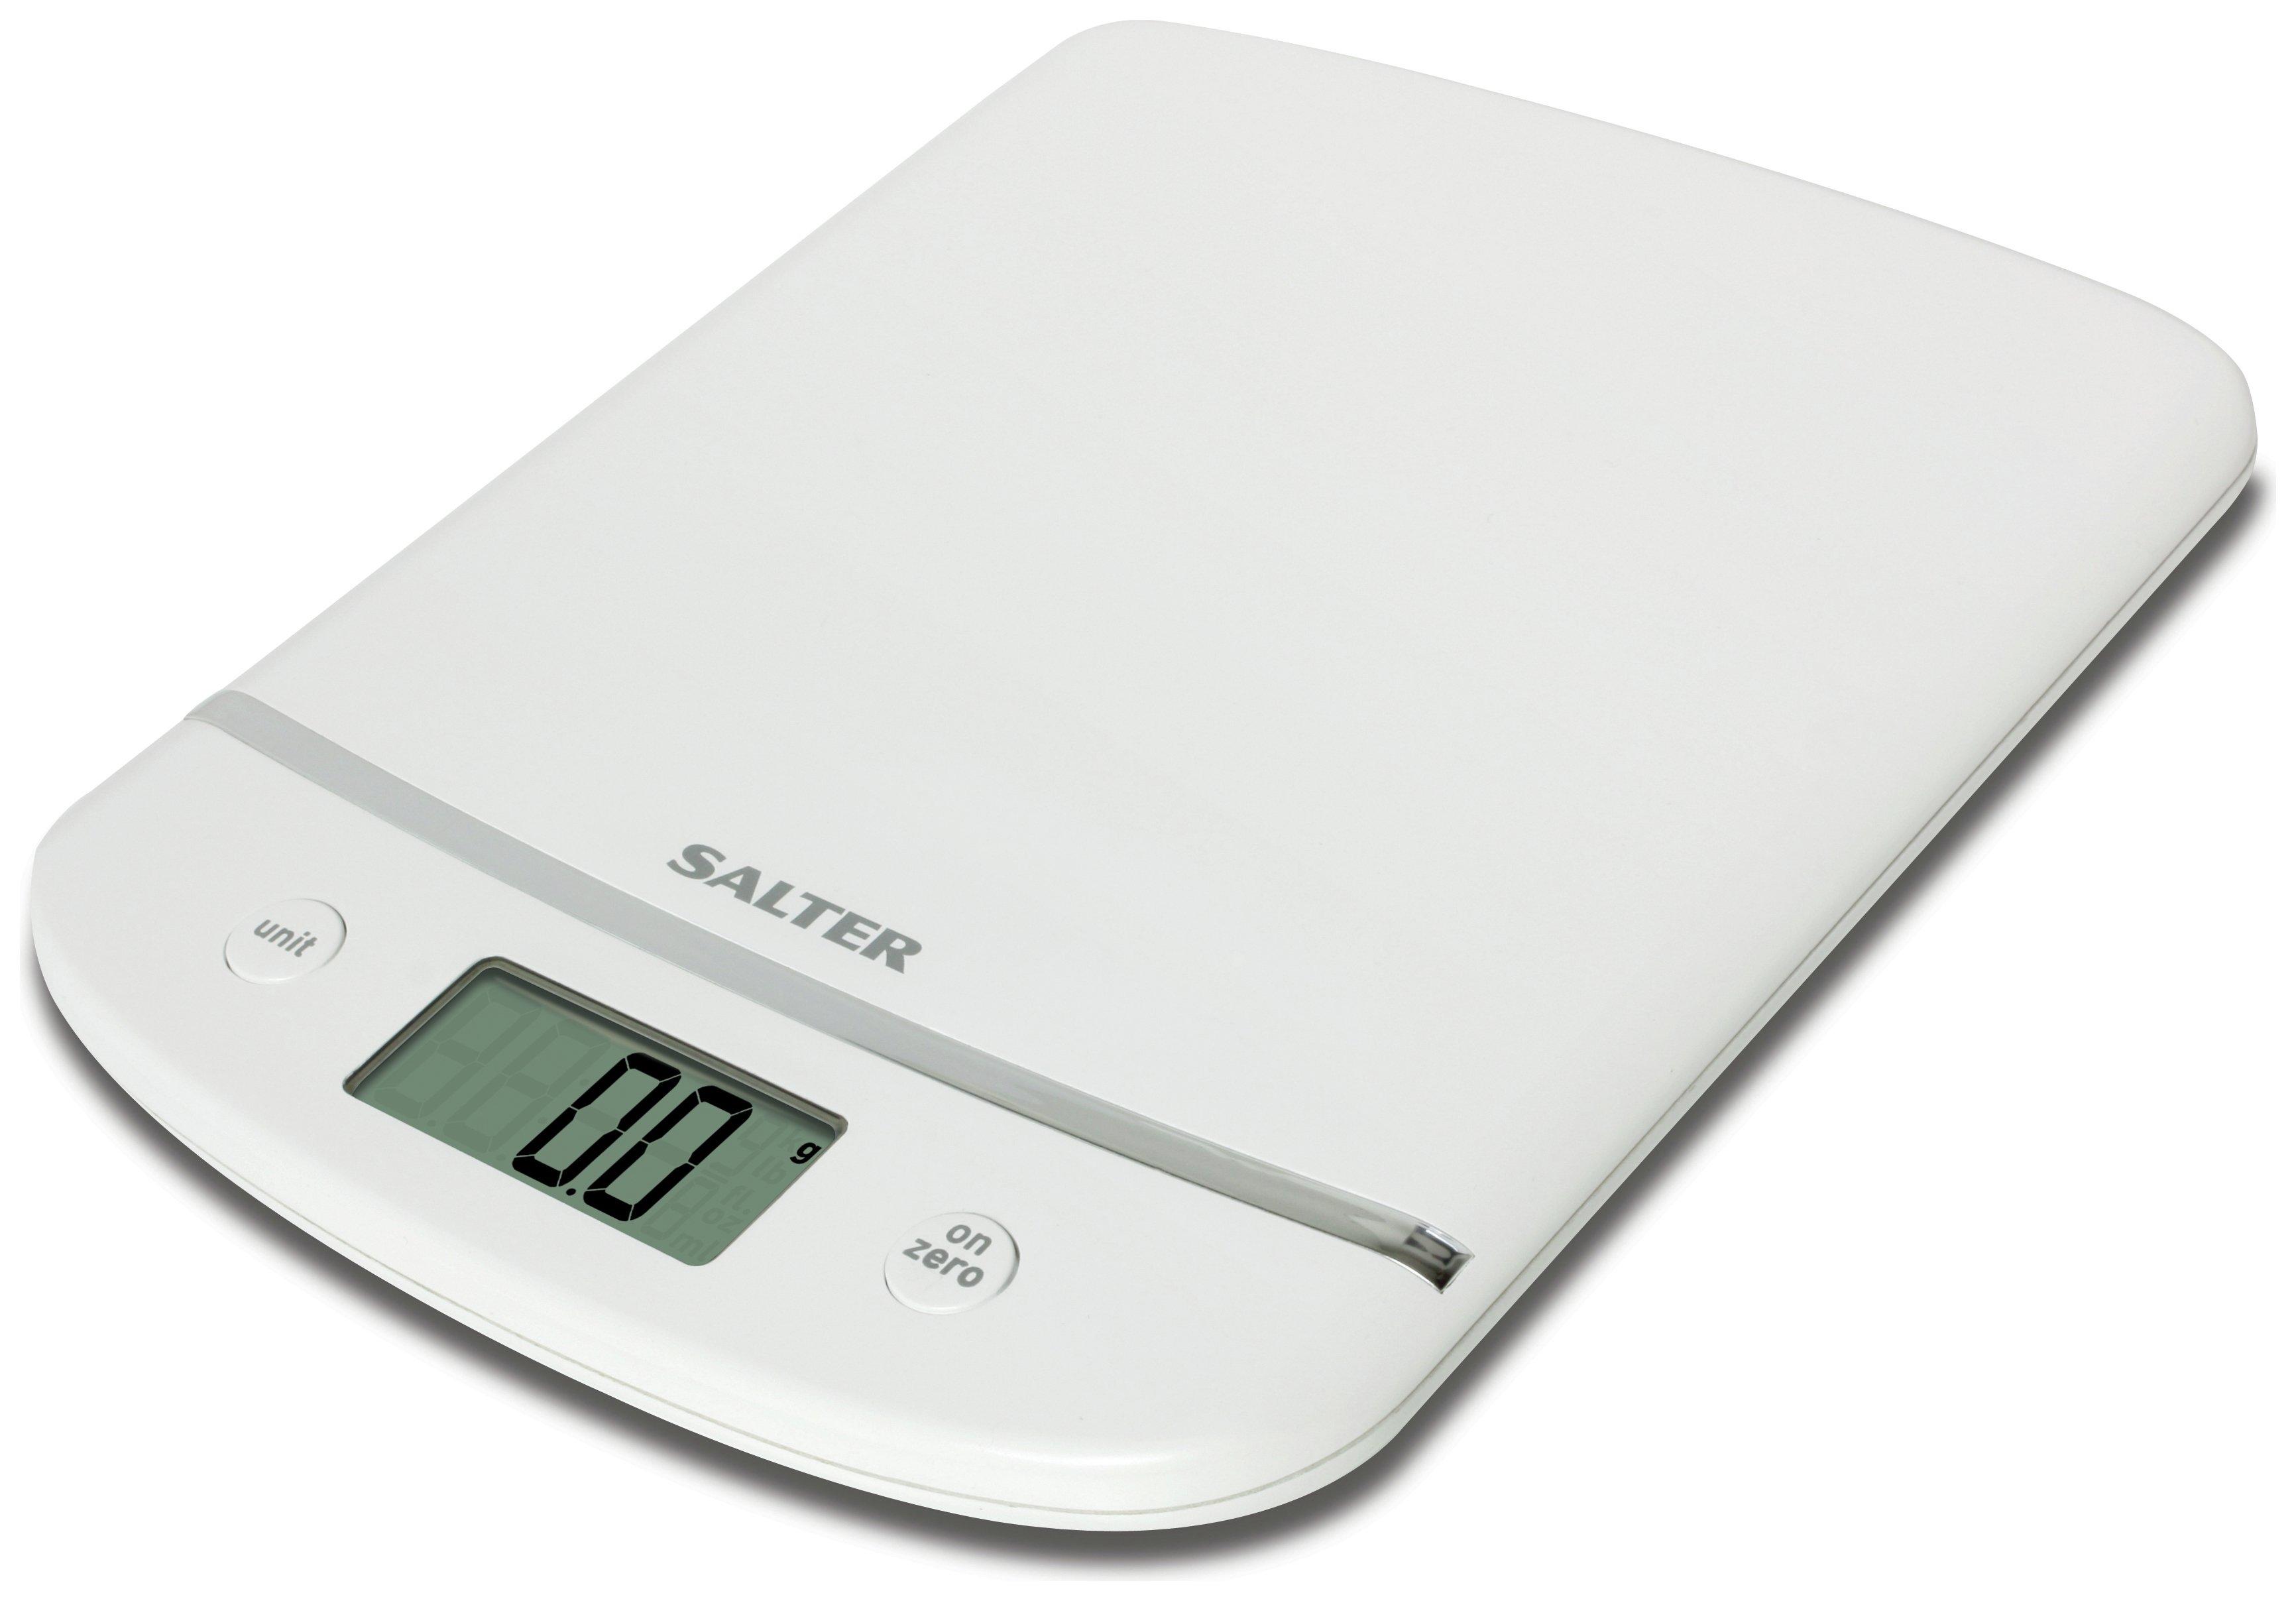 salter-aquatronic-kitchen-scale-white